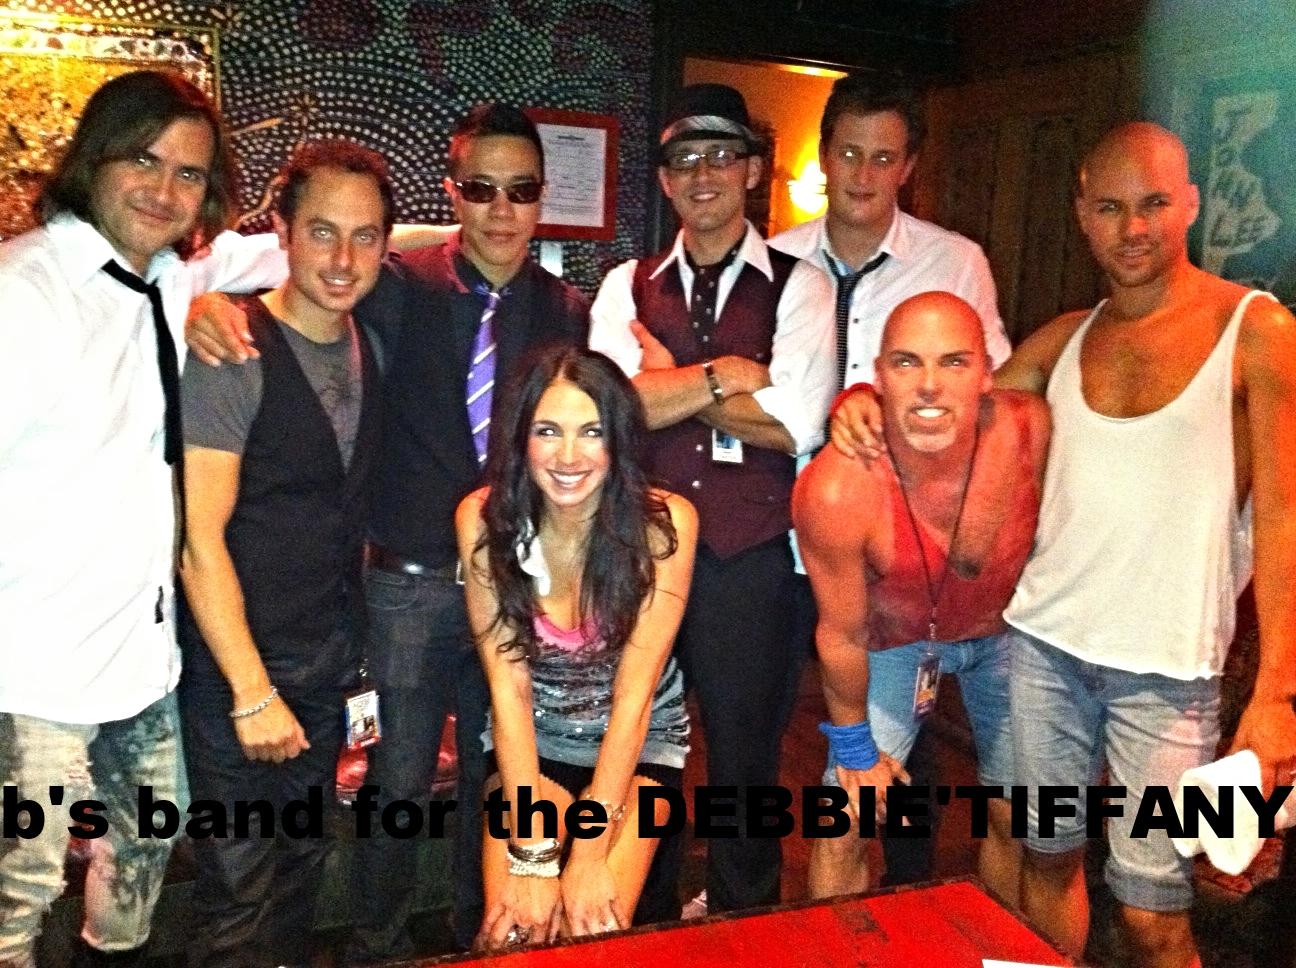 band pic backstage.jpg